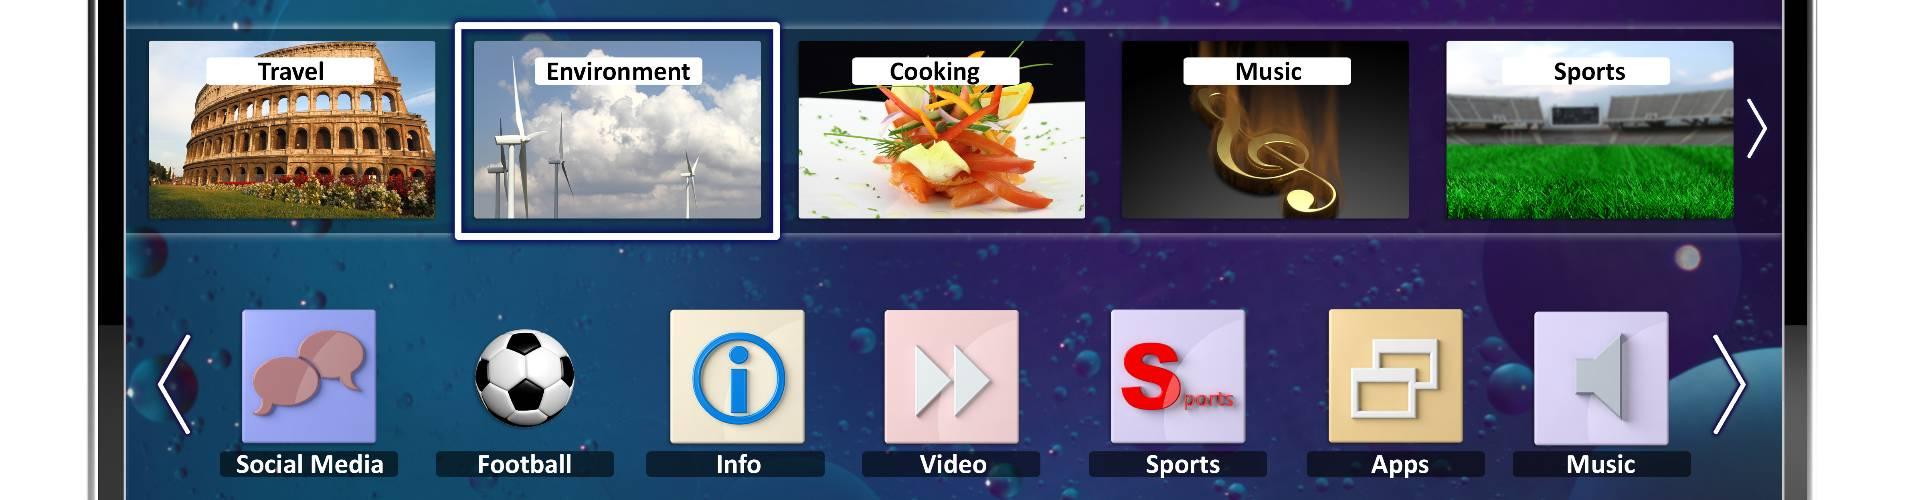 LG Smart TVs Leak Data Without Permission